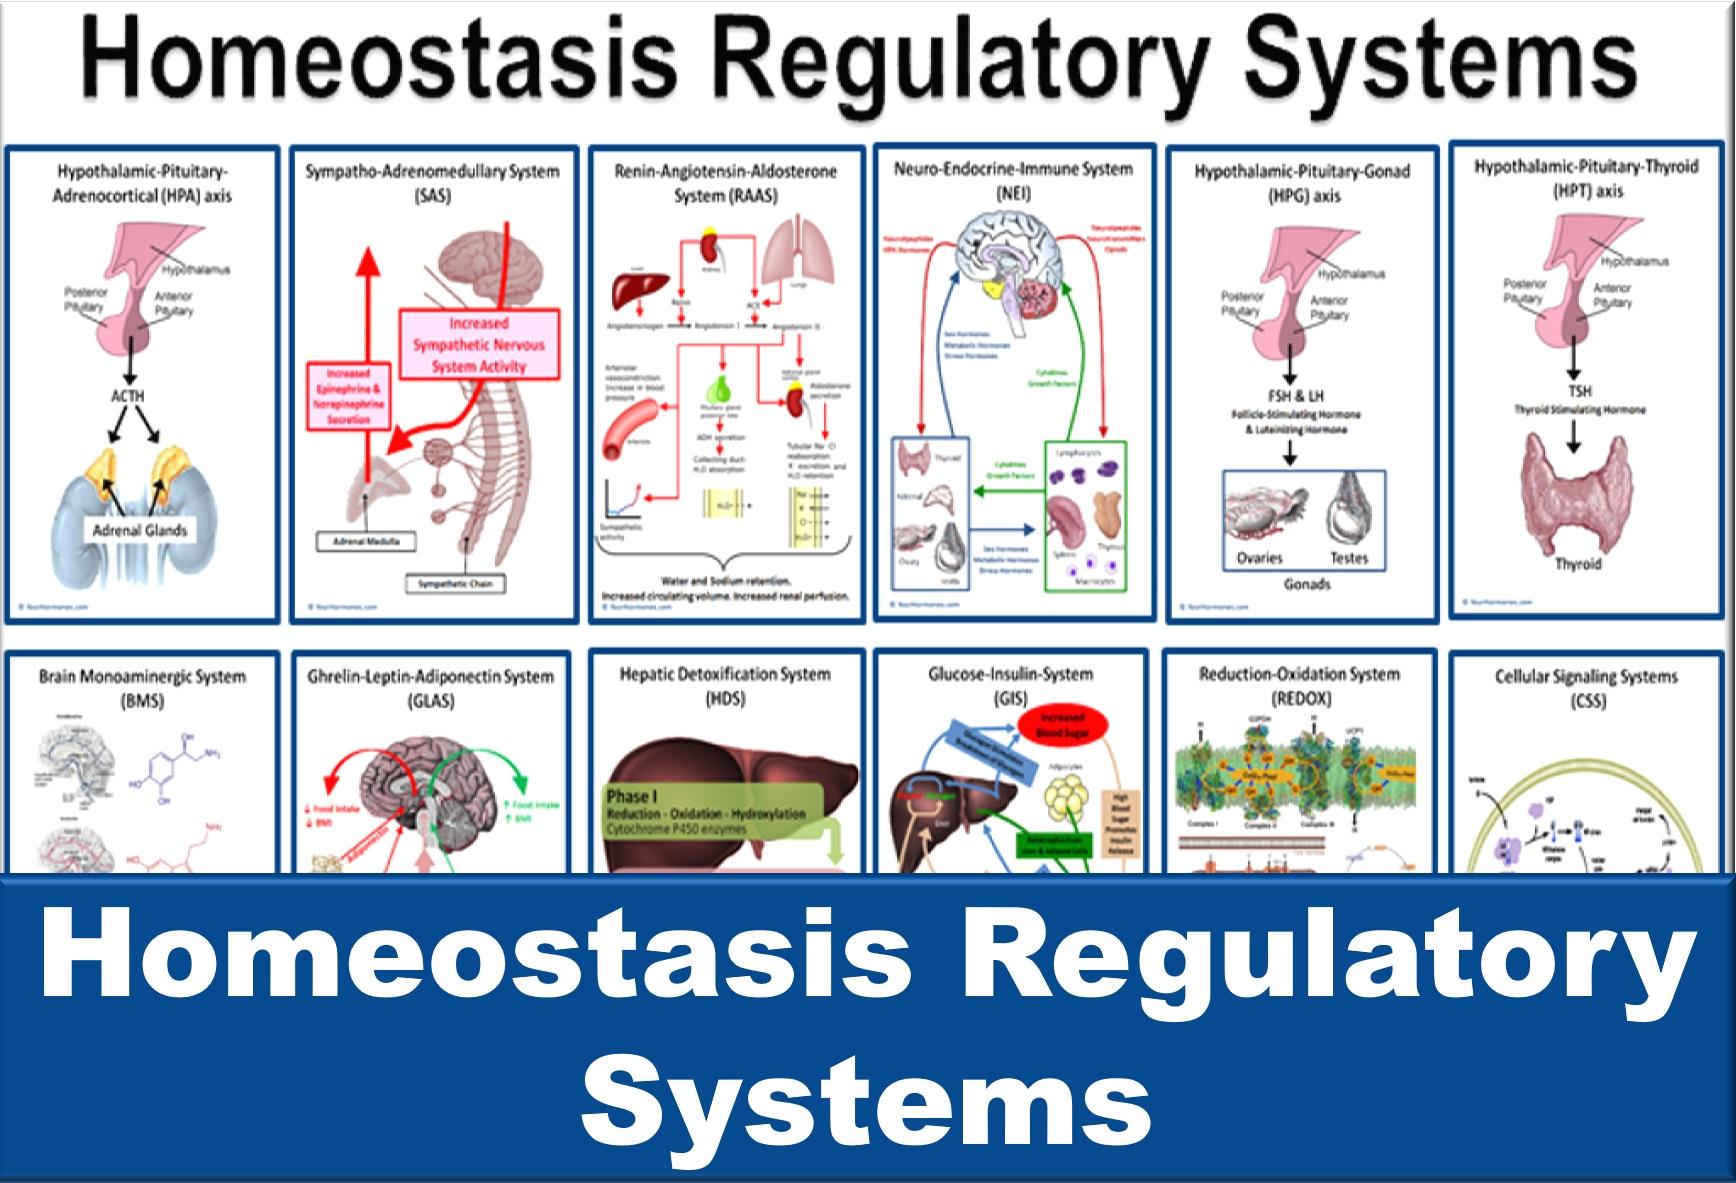 Homeostasis Regulatory Systems